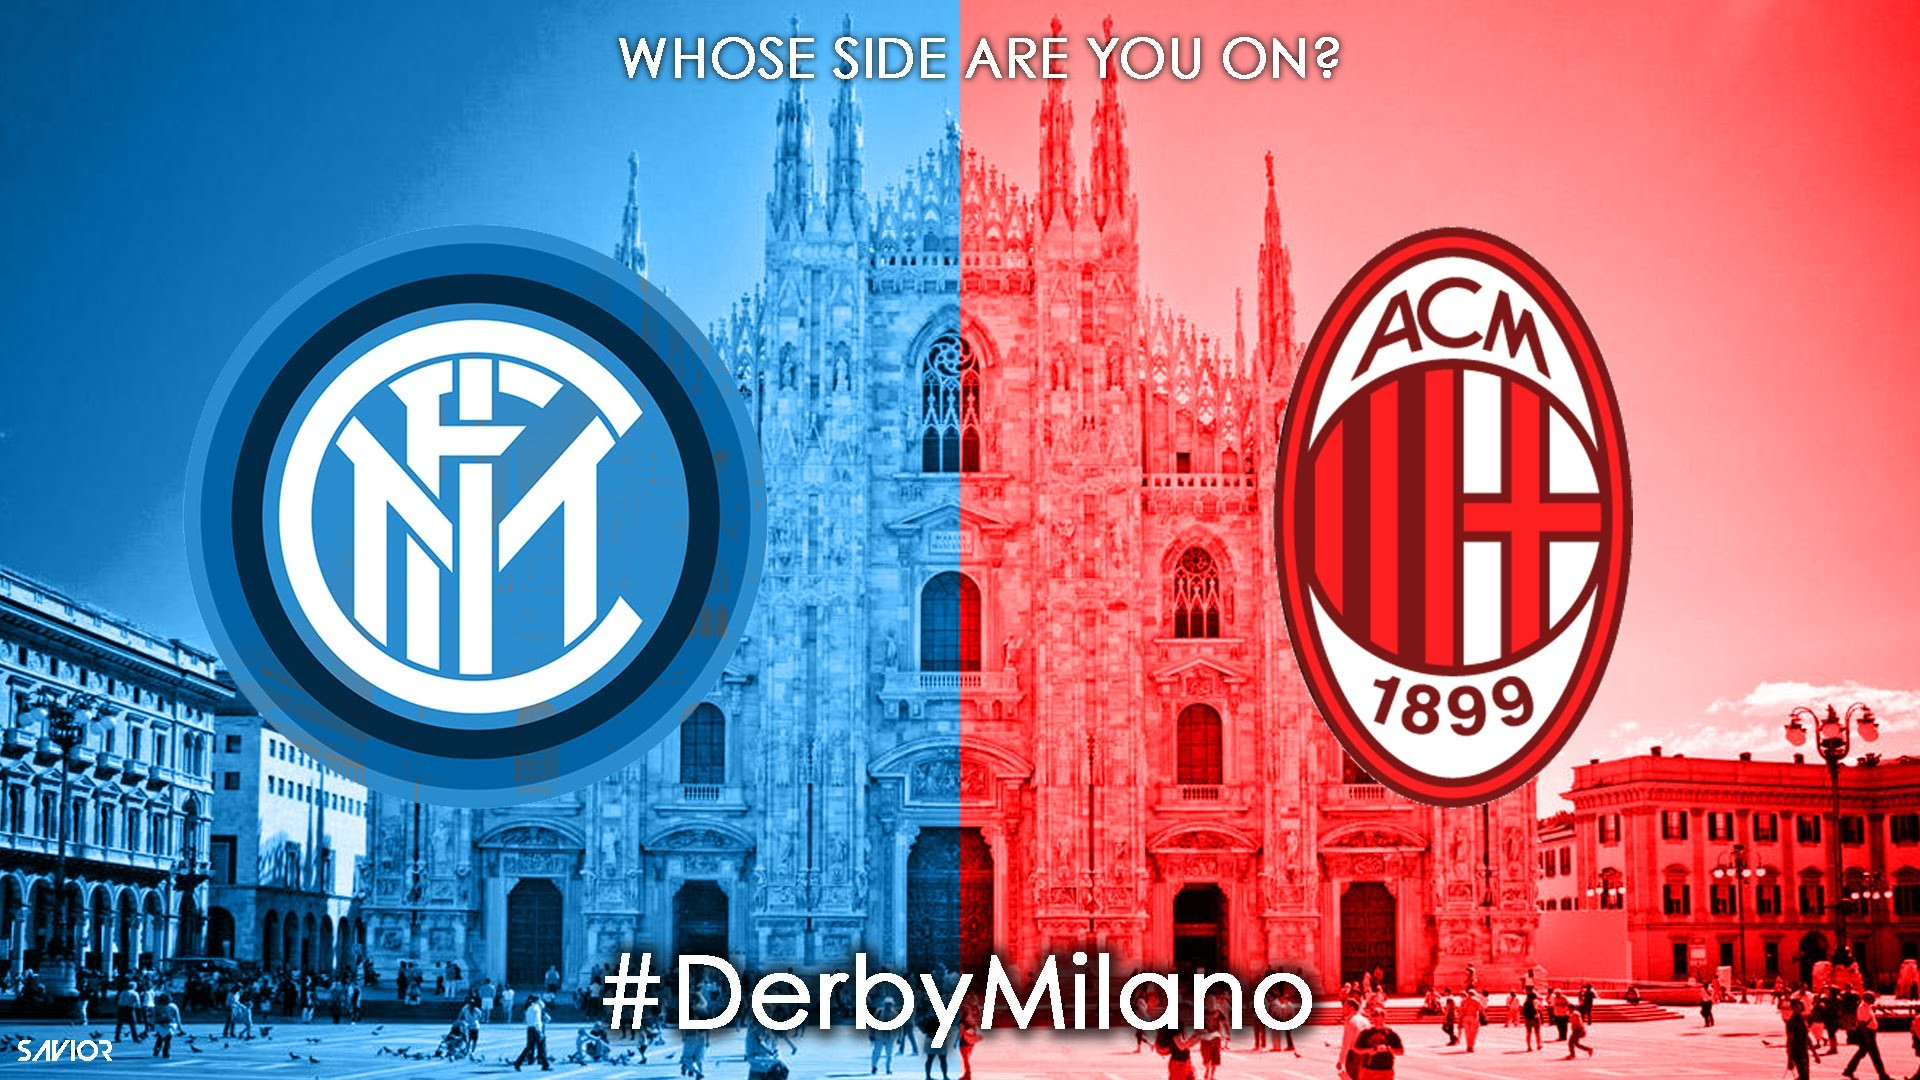 PROMO F.C. INTER vs A.C. MILAN 2015/16